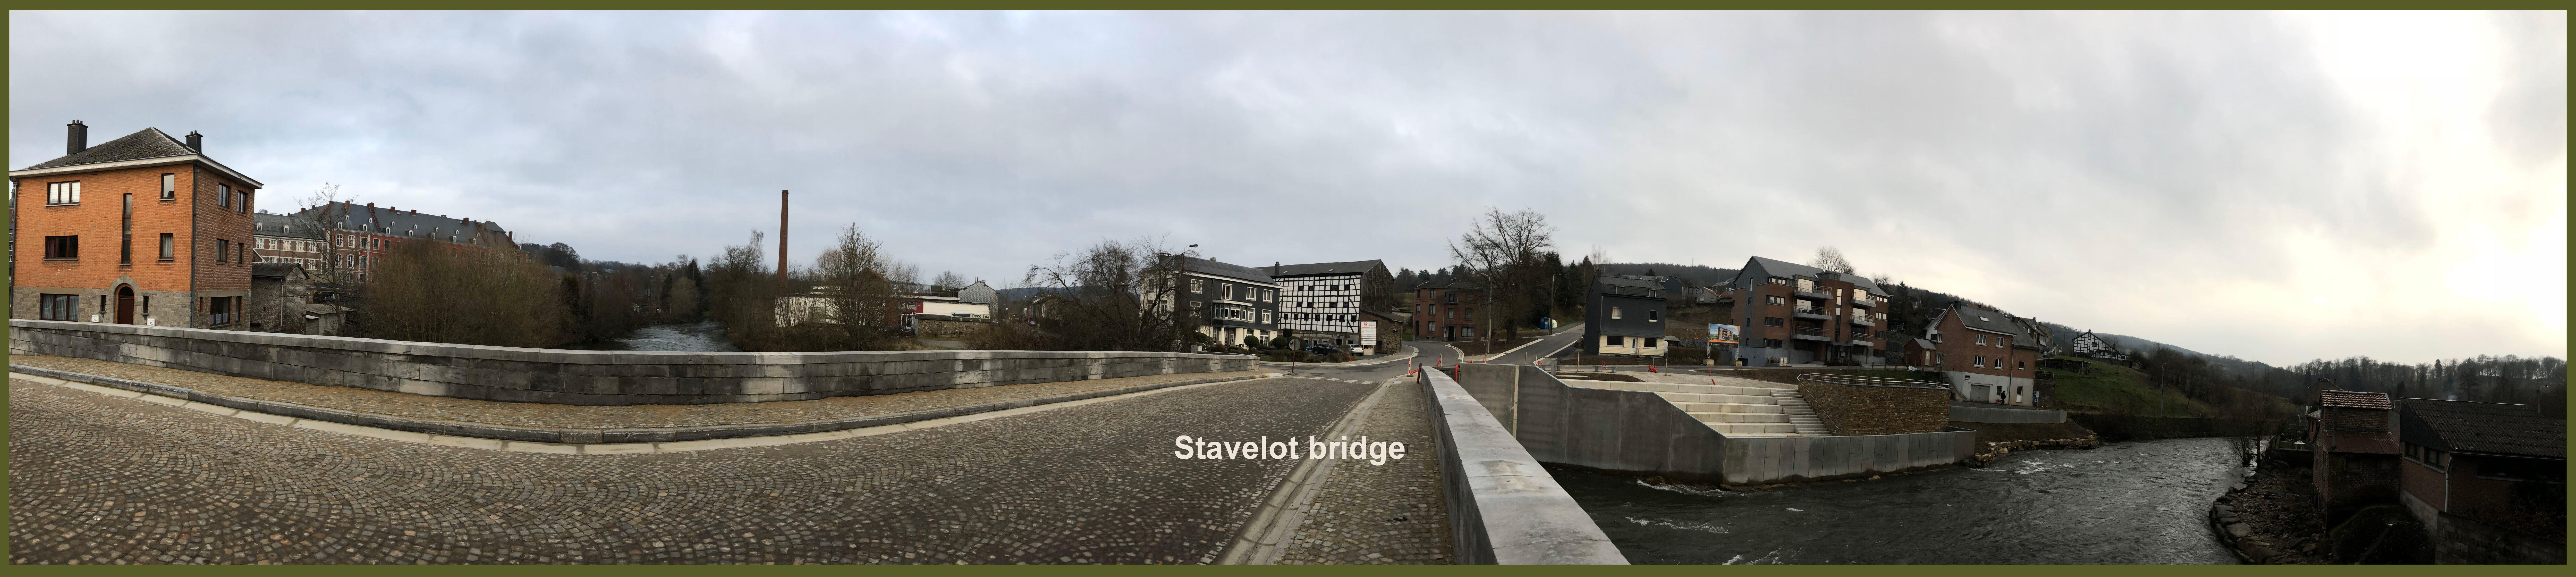 Stavelot bridge landscape